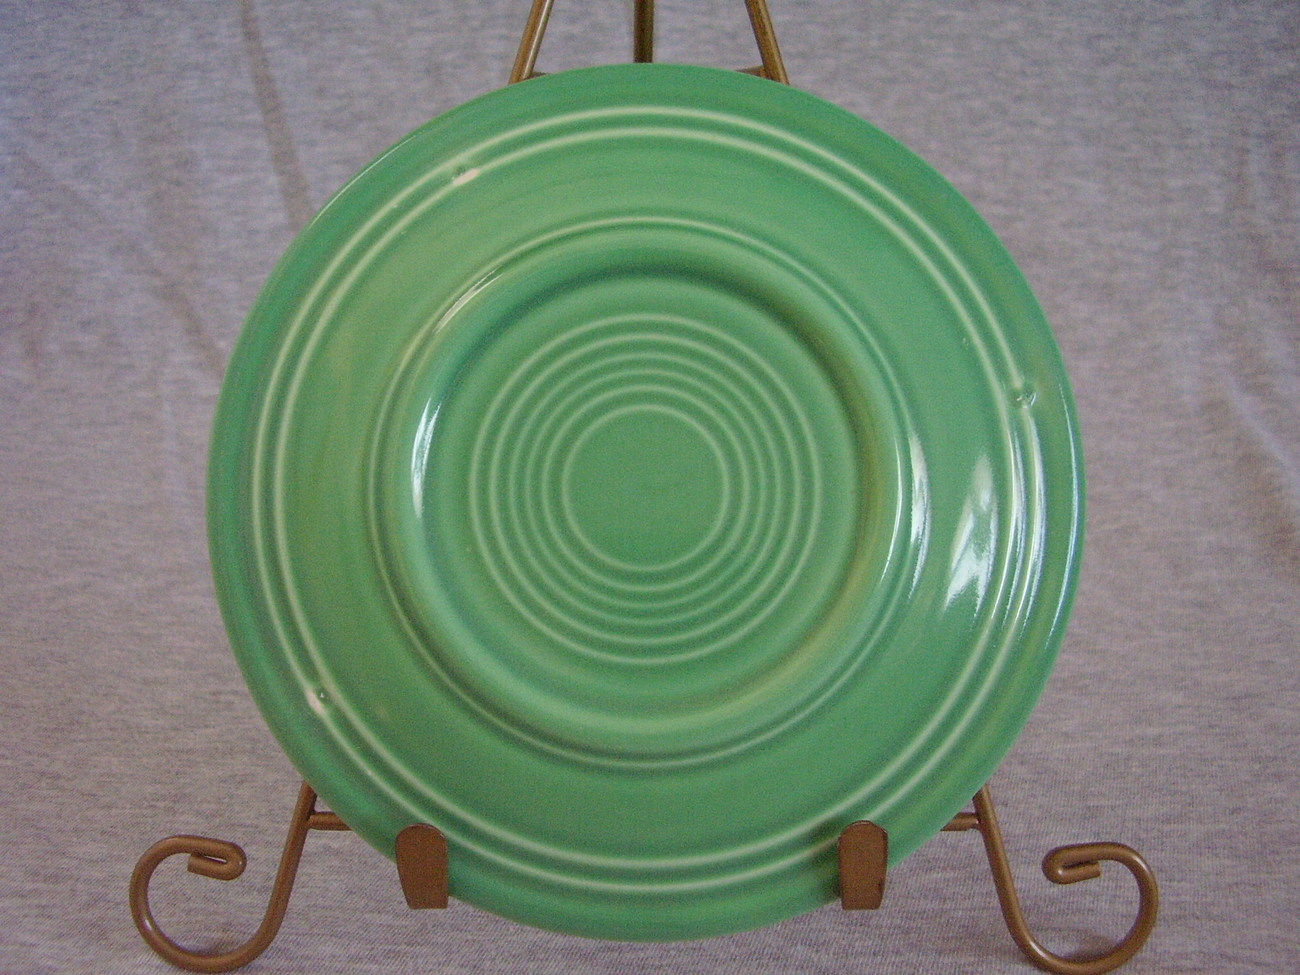 Vintage Fiestaware Original Green Bread Butter Plate  D